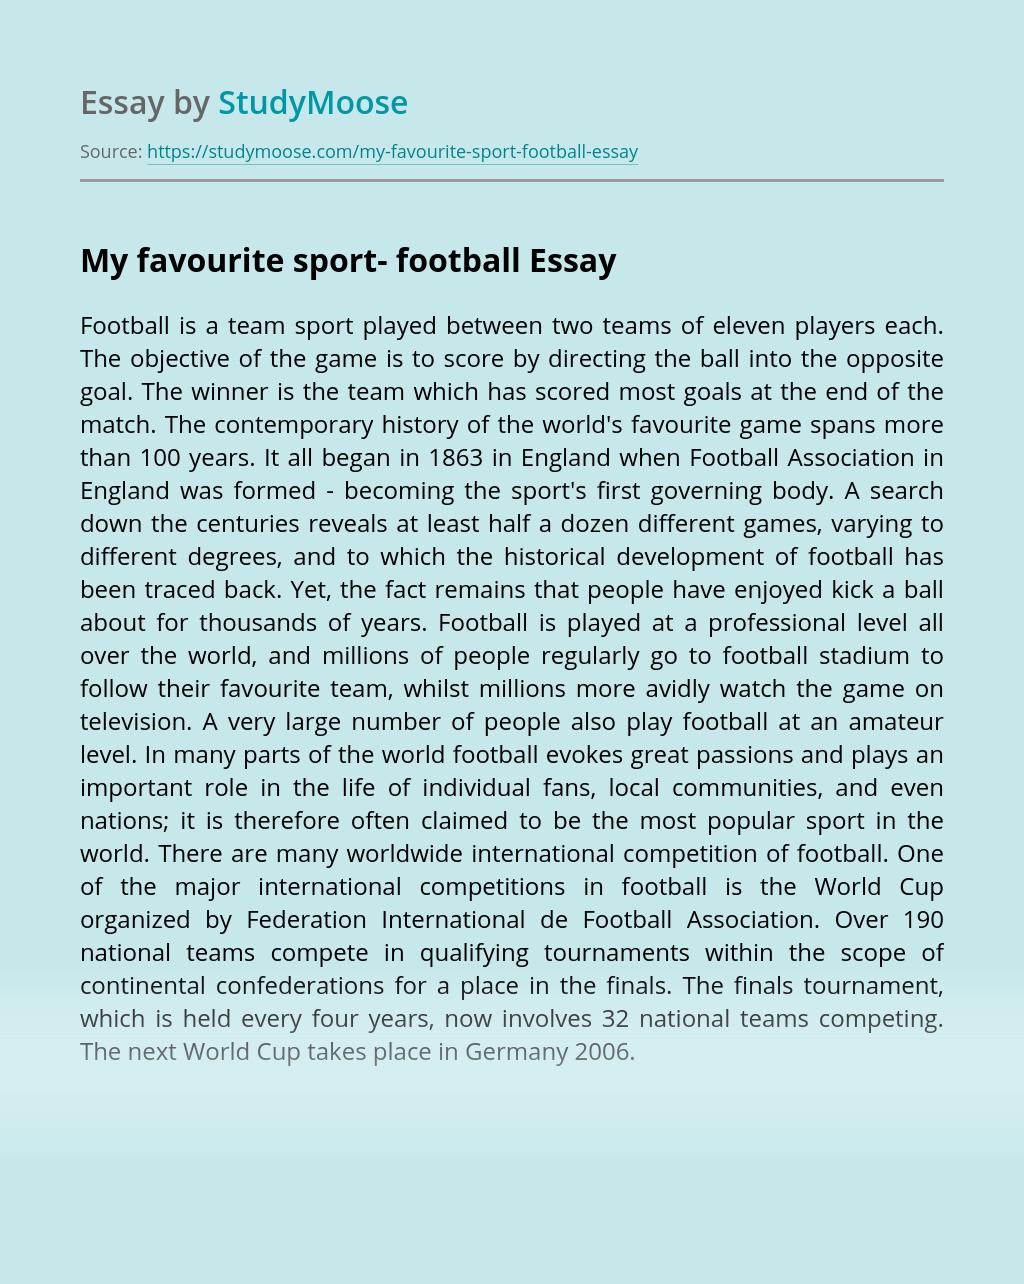 My favourite sport- football